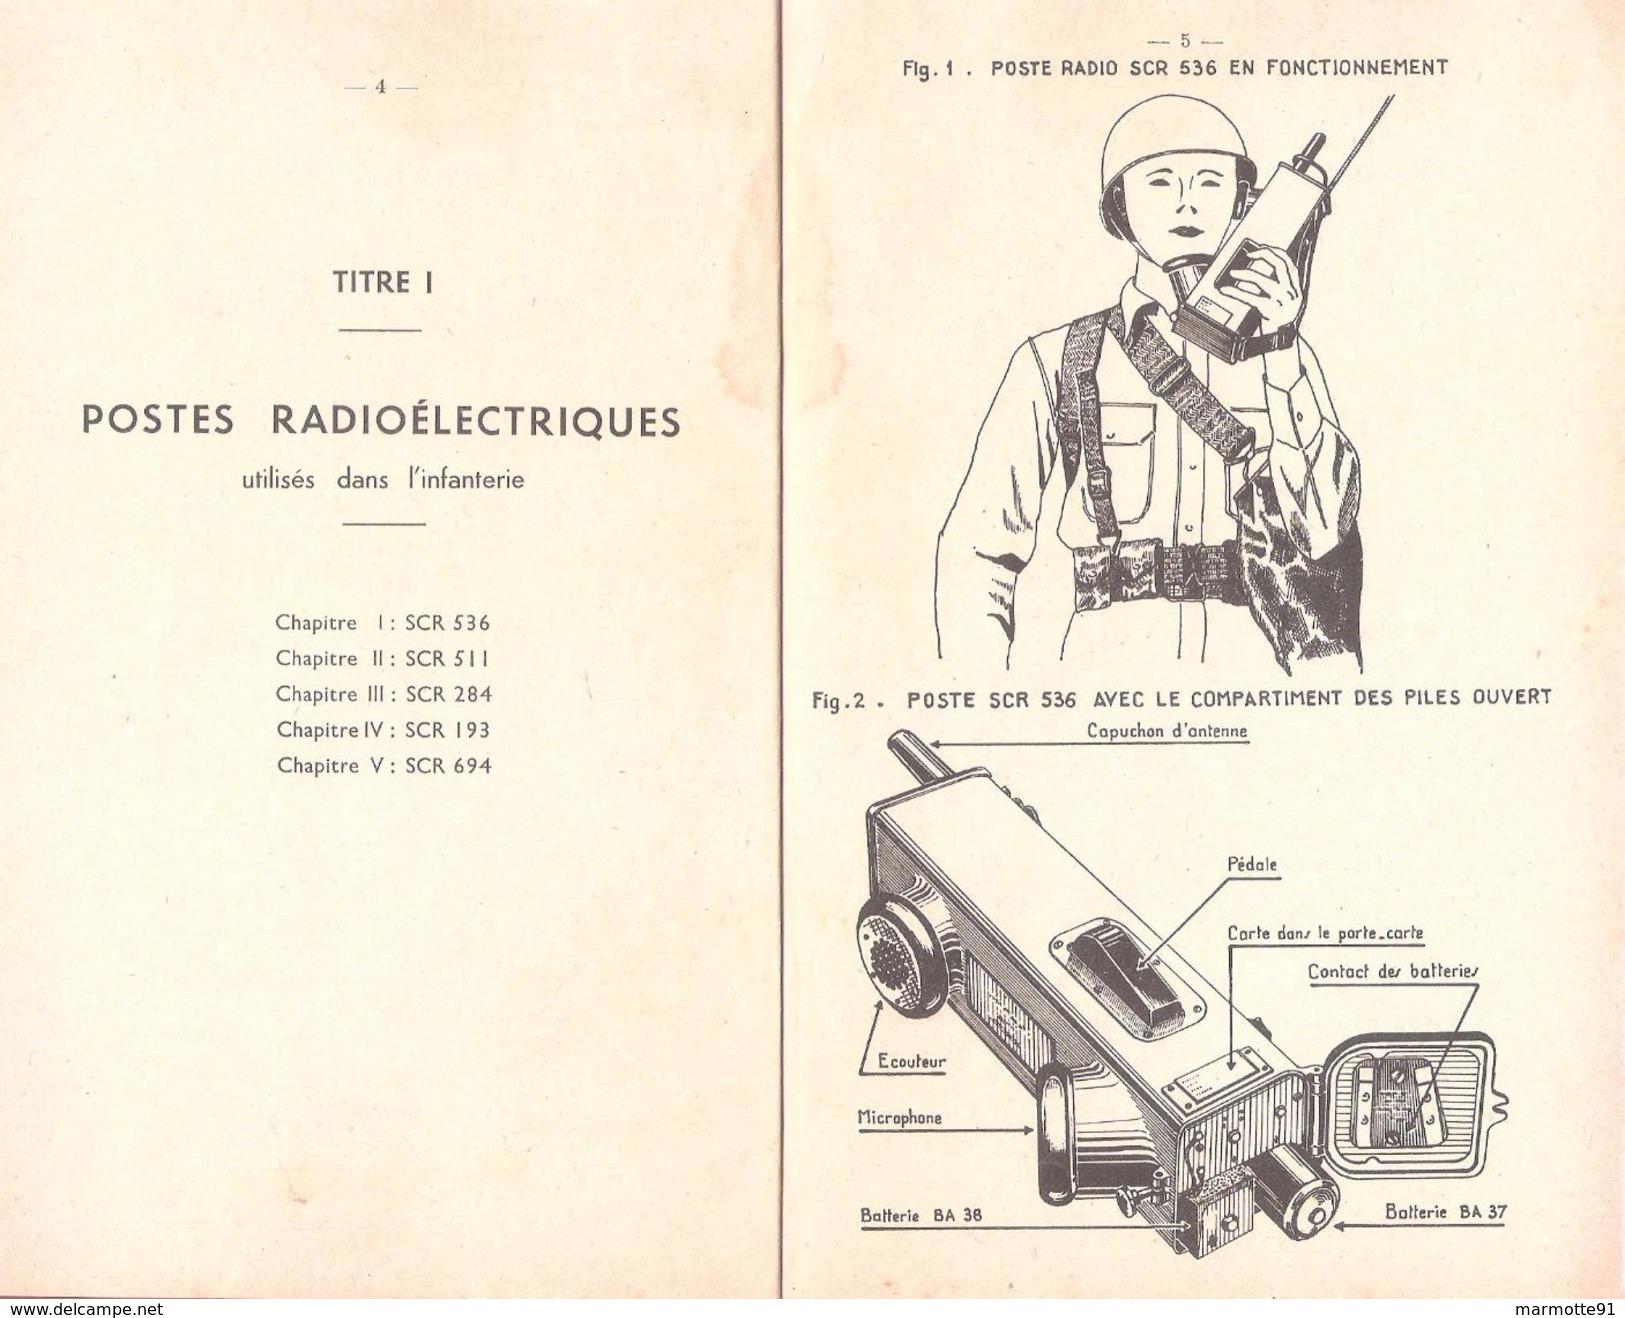 MANUEL EMPLOI POSTES RADIOELECTRIQUES US ARMY 1947 TRANSMISSIONS SCR POSTE RADIO - Radio